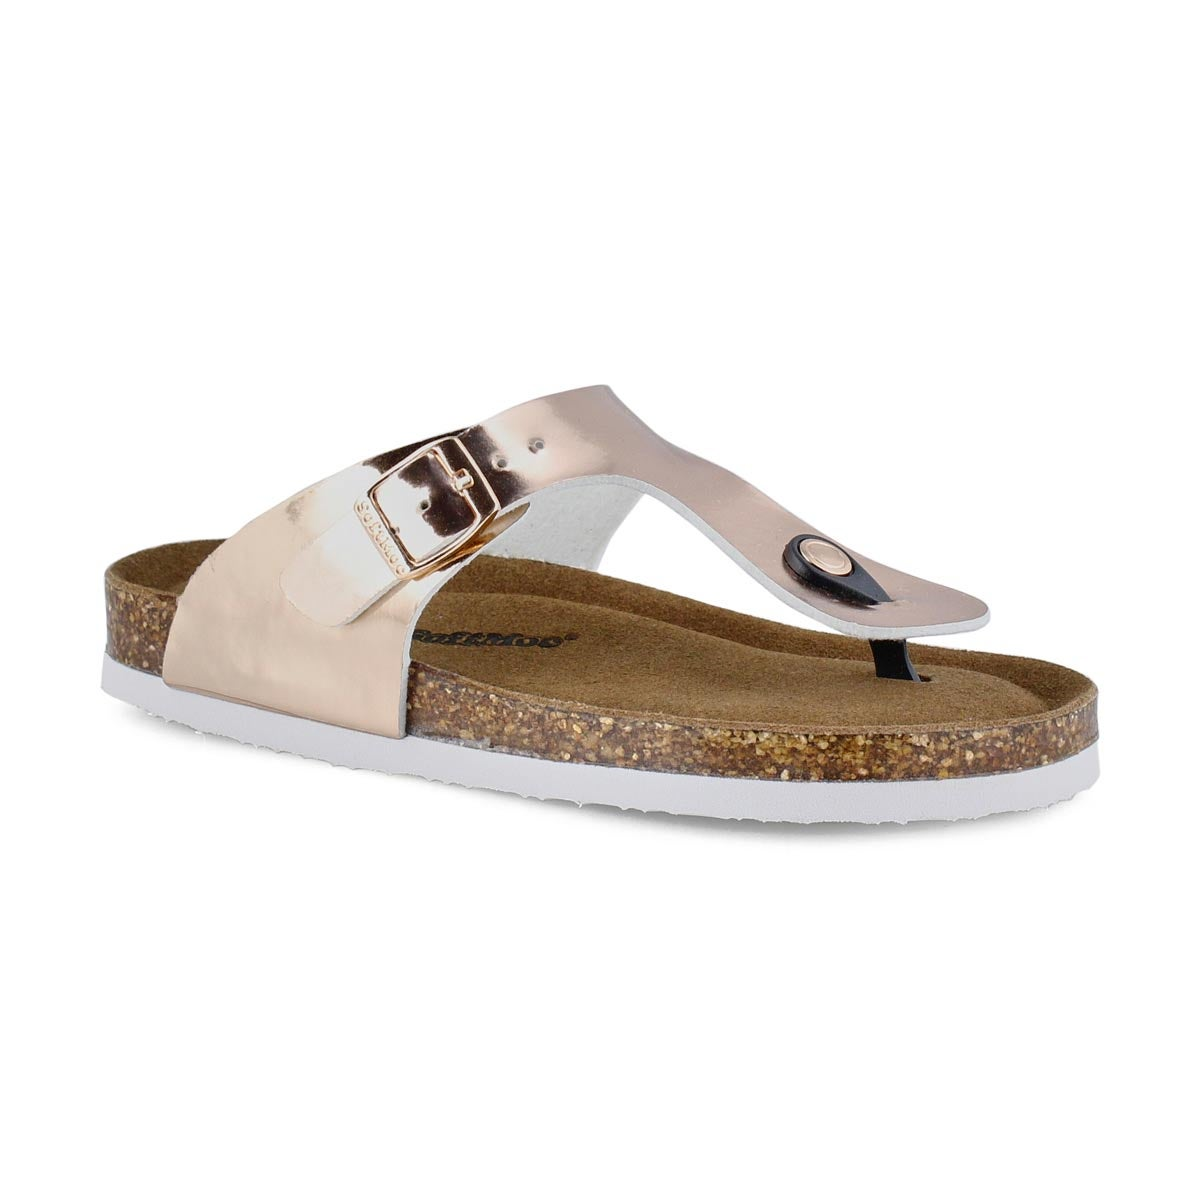 Grls Angy 6 gld pat mem foam thng sandal